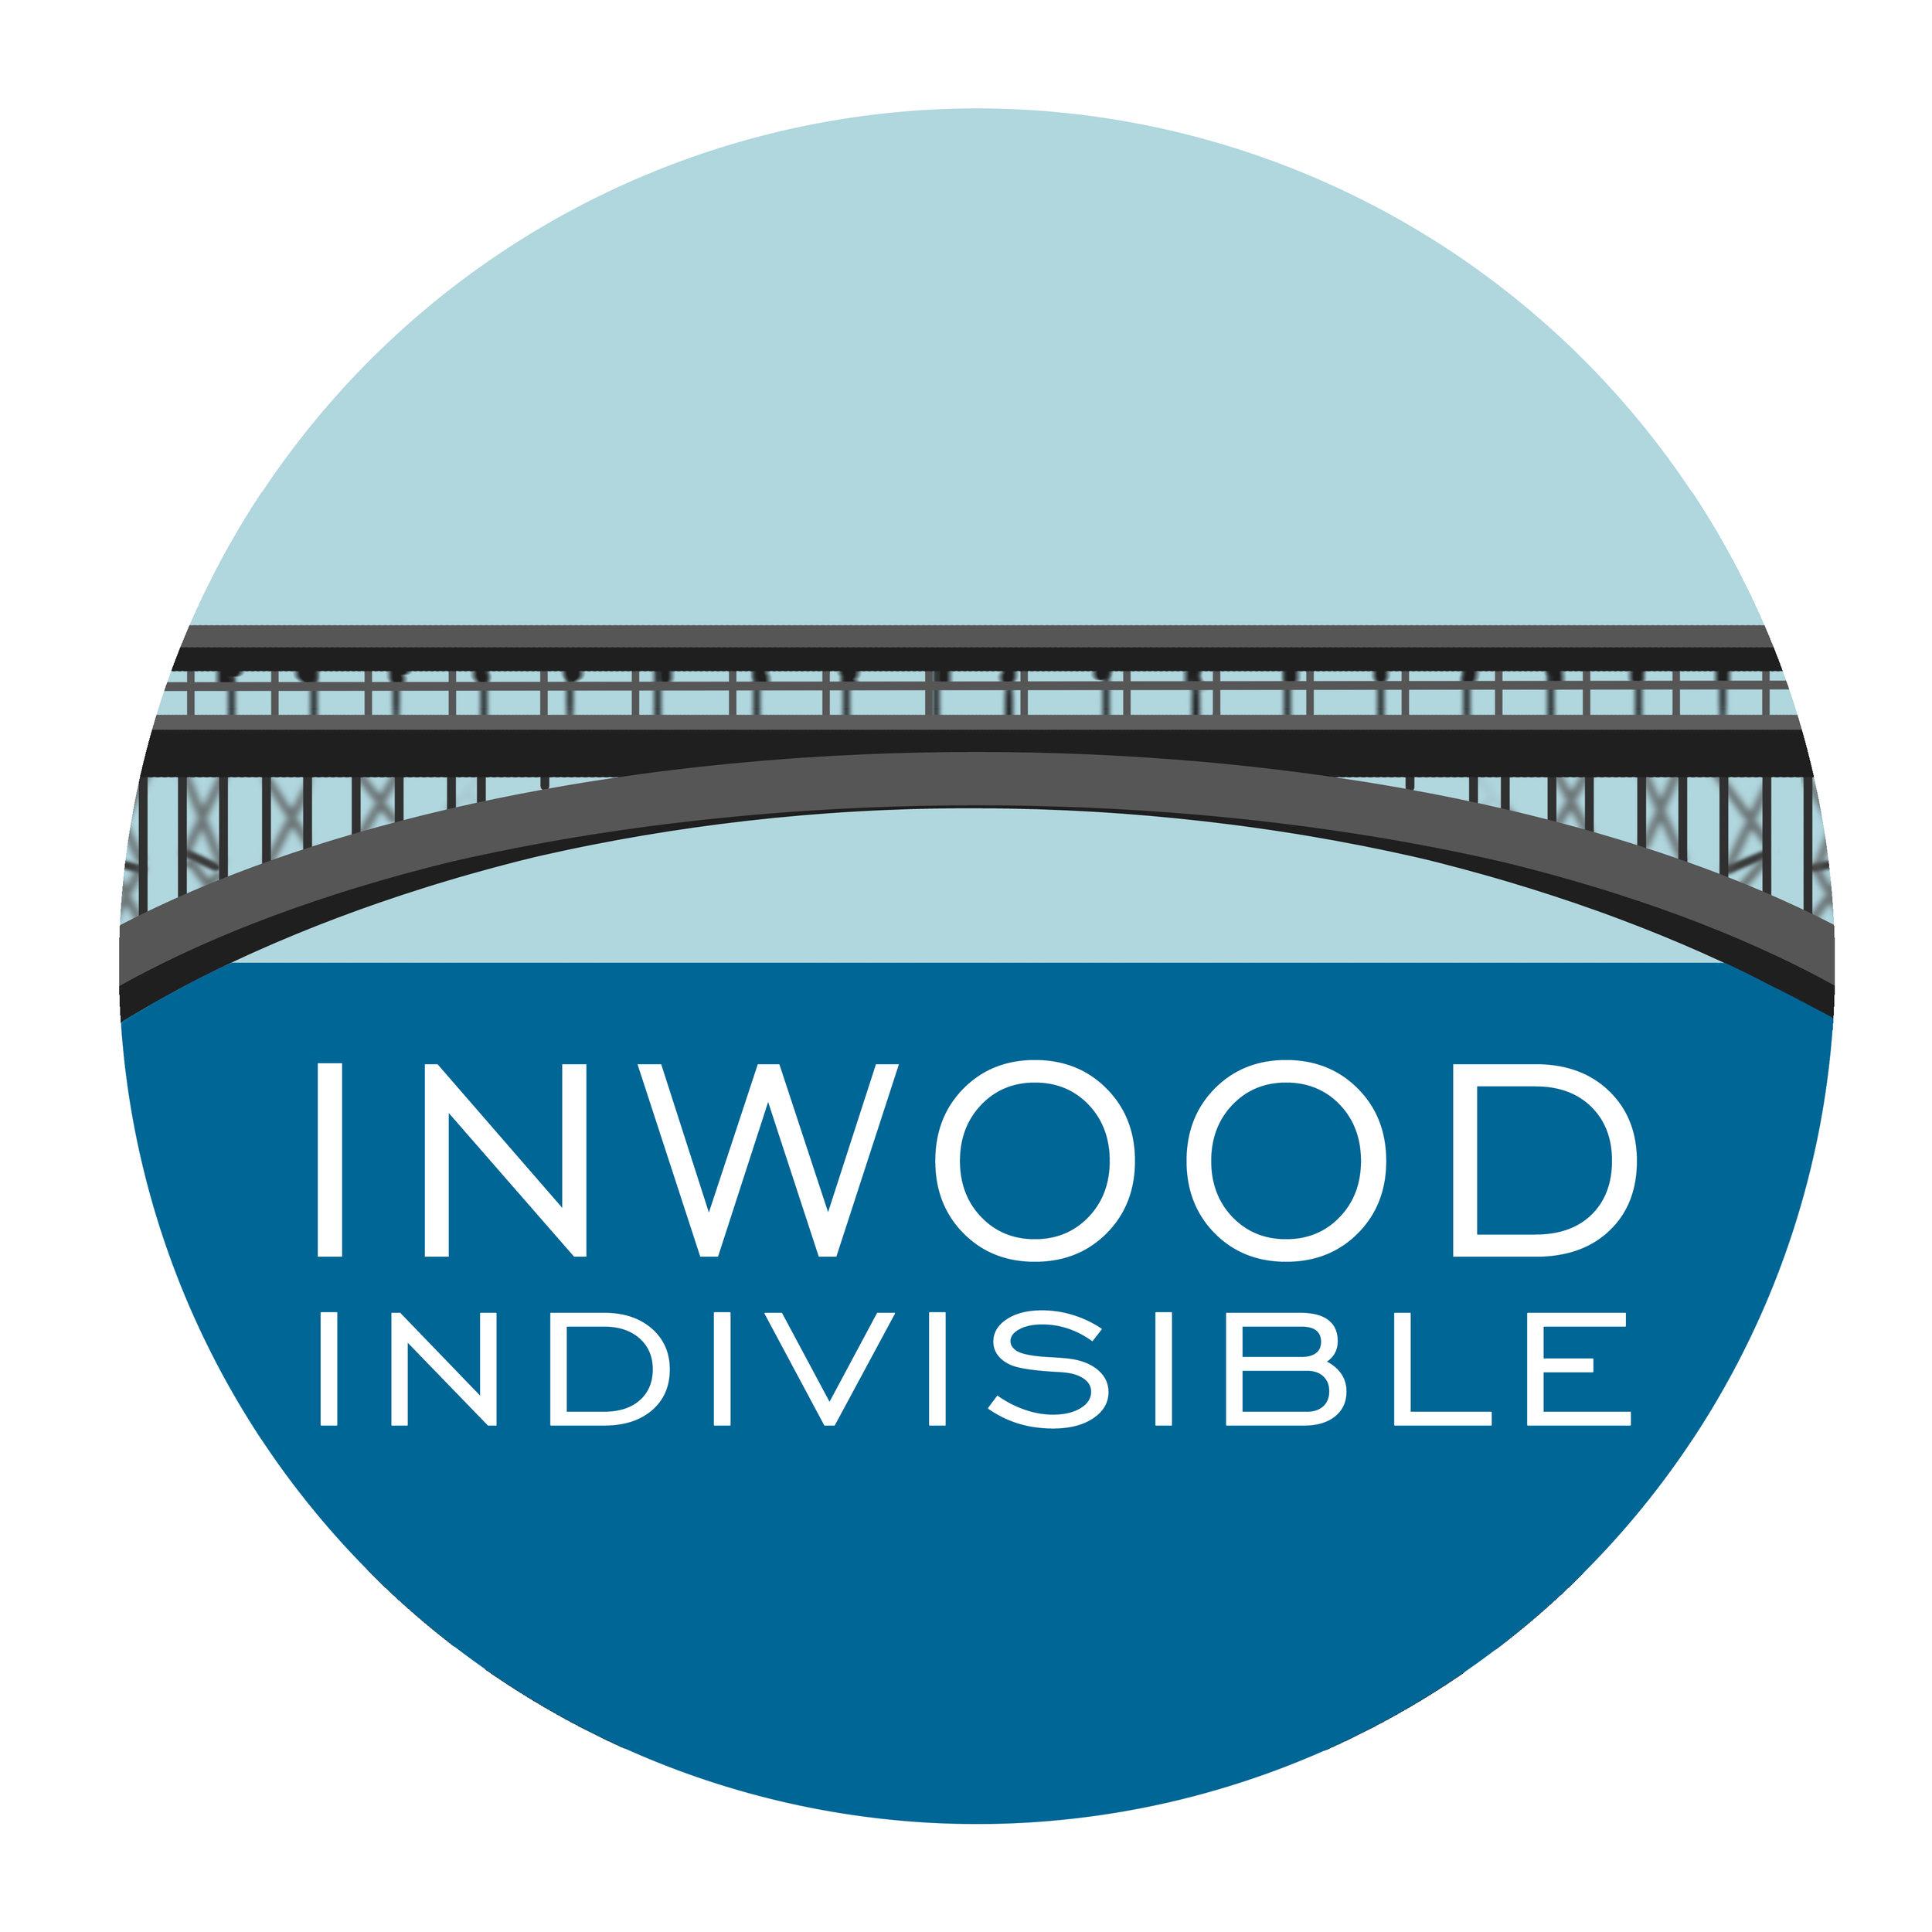 InwoodIndivisibleLogo.jpg